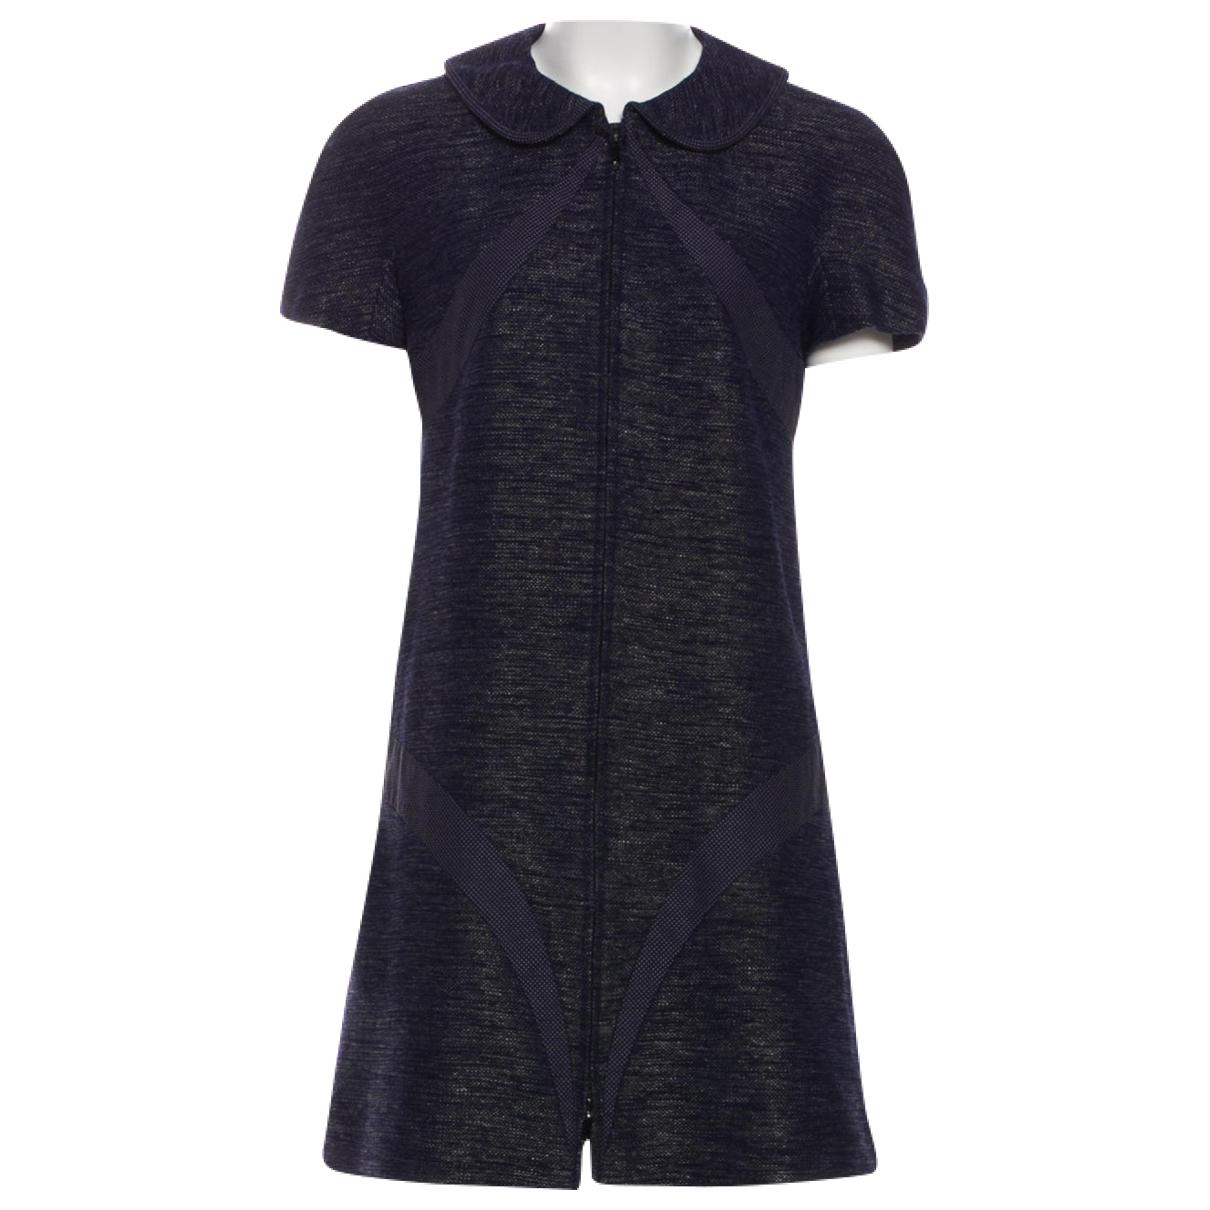 Chanel \N Navy Cotton dress for Women 40 FR